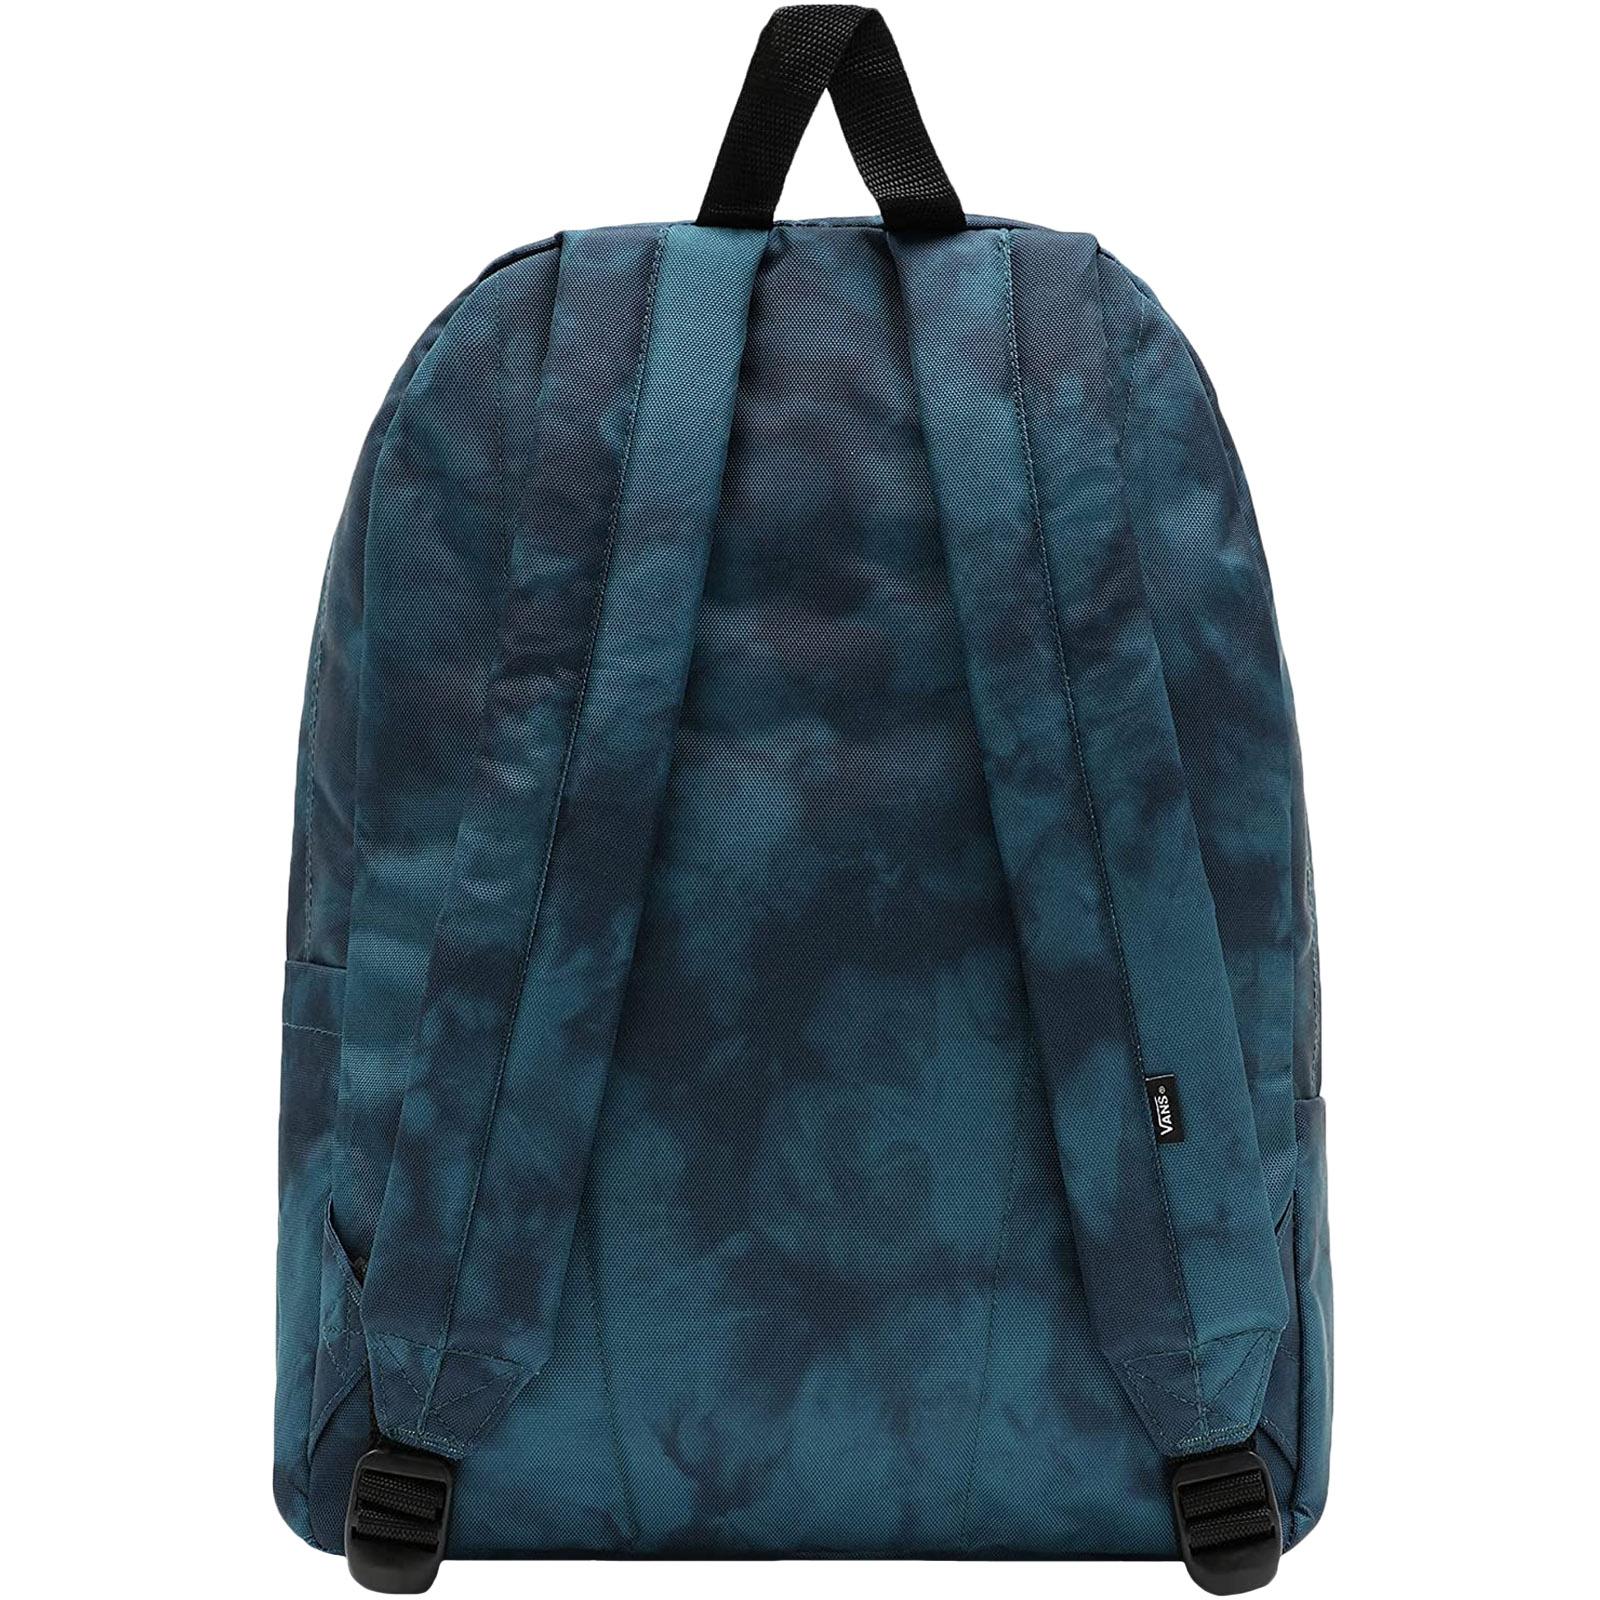 thumbnail 5 - Vans Unisex Old Skool III Adjustable Strap School Travel Rucksack Backpack Bag